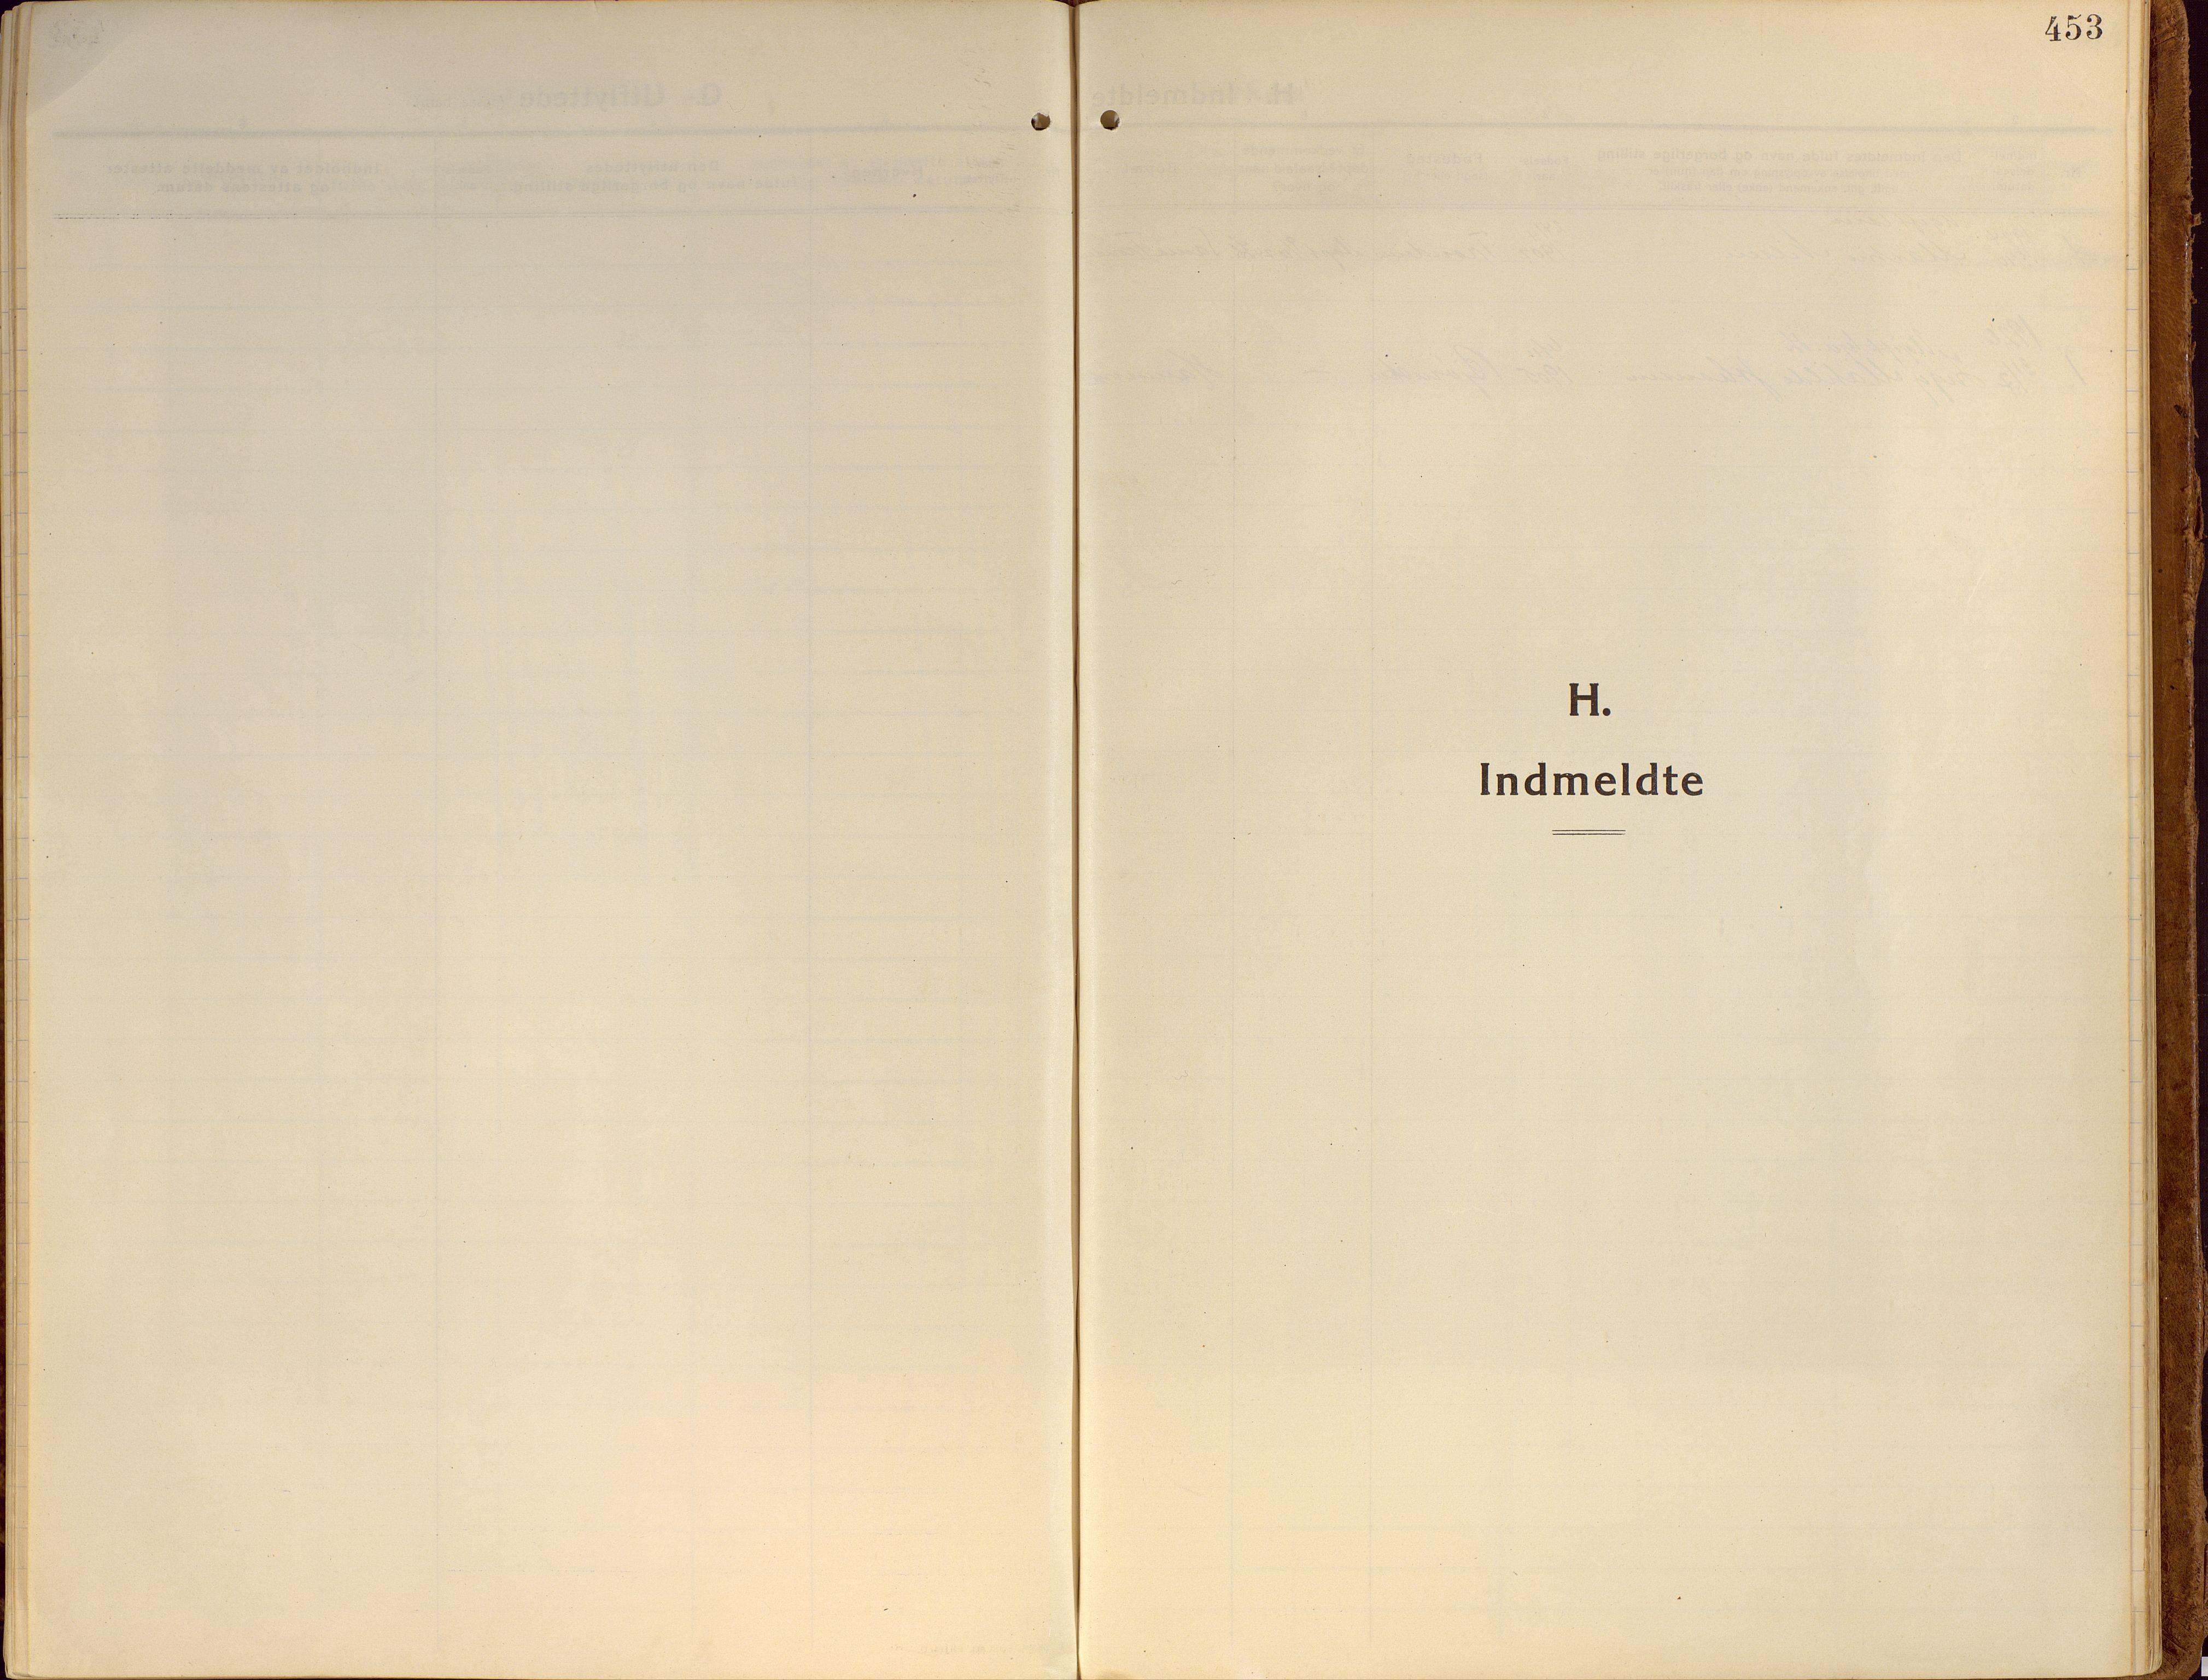 SATØ, Ibestad sokneprestembete, Ministerialbok nr. 18, 1915-1929, s. 453